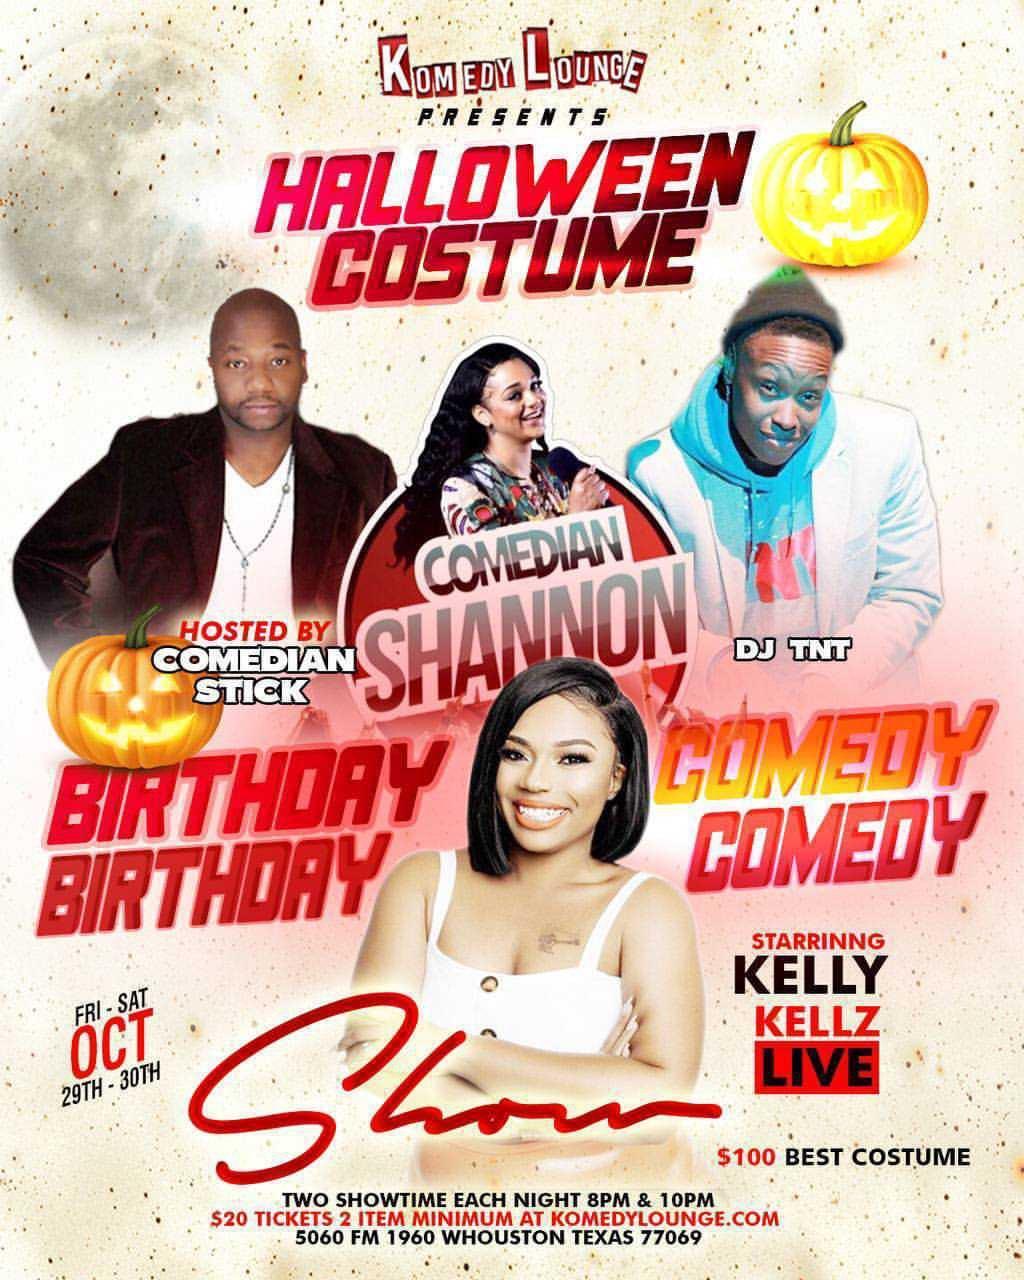 Kelly Kellz Birthday Bash 8pm Halloween, Birthday Celebration & Comedy on Oct 29, 20:00@Komedy Lounge - Buy tickets and Get information on komedylounge.com